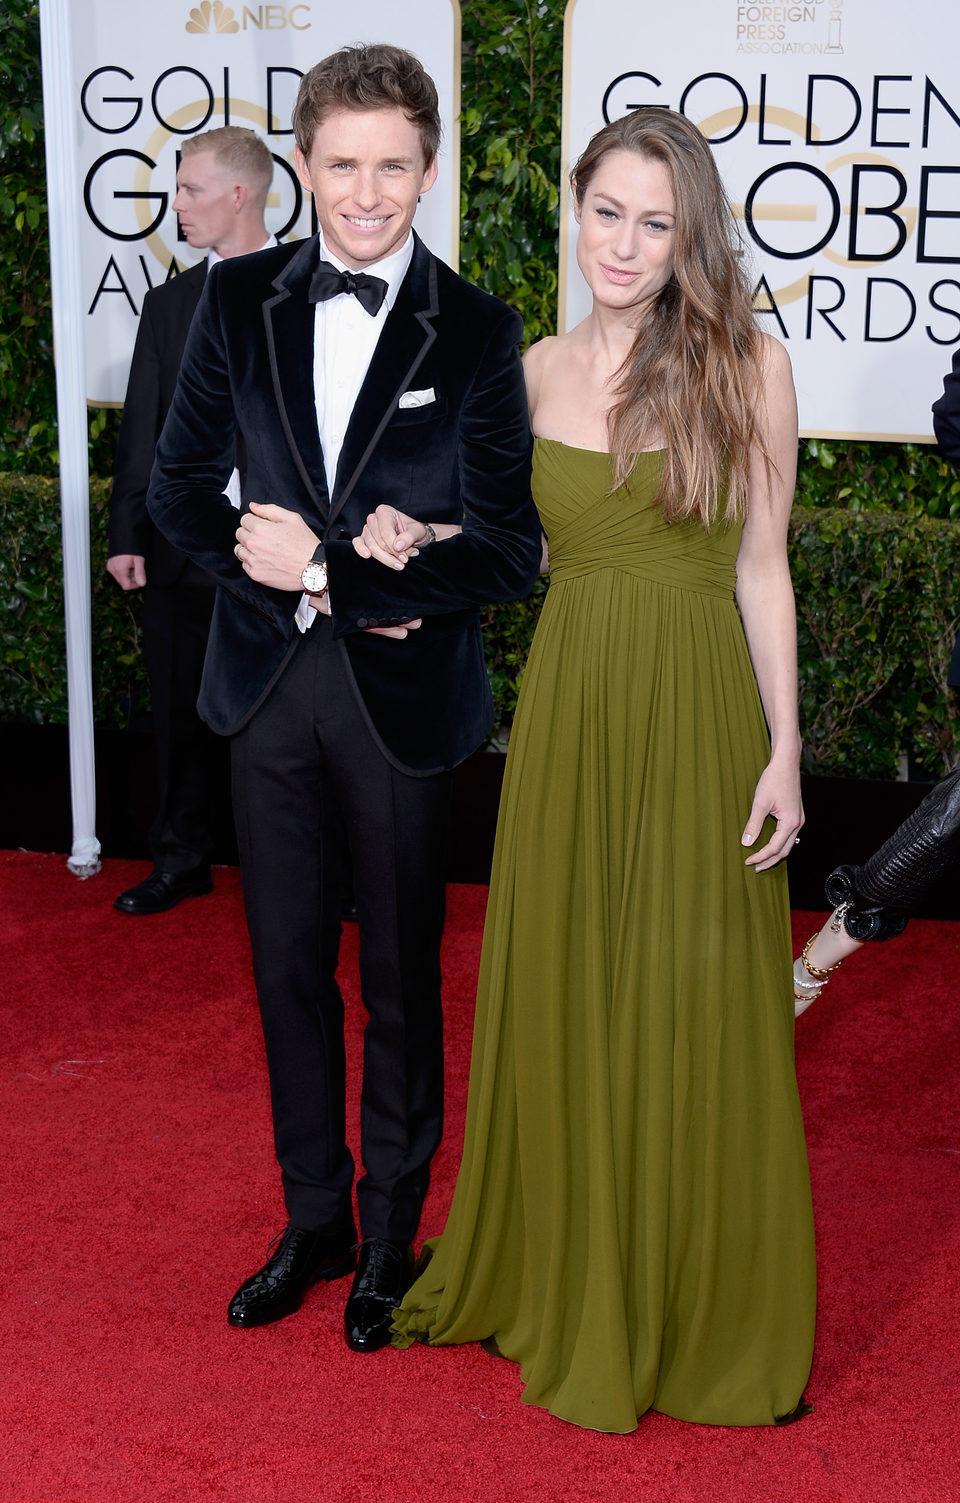 Eddie Redmayne and Hannah Bagshawe at the Golden Globe 2015 red carpet